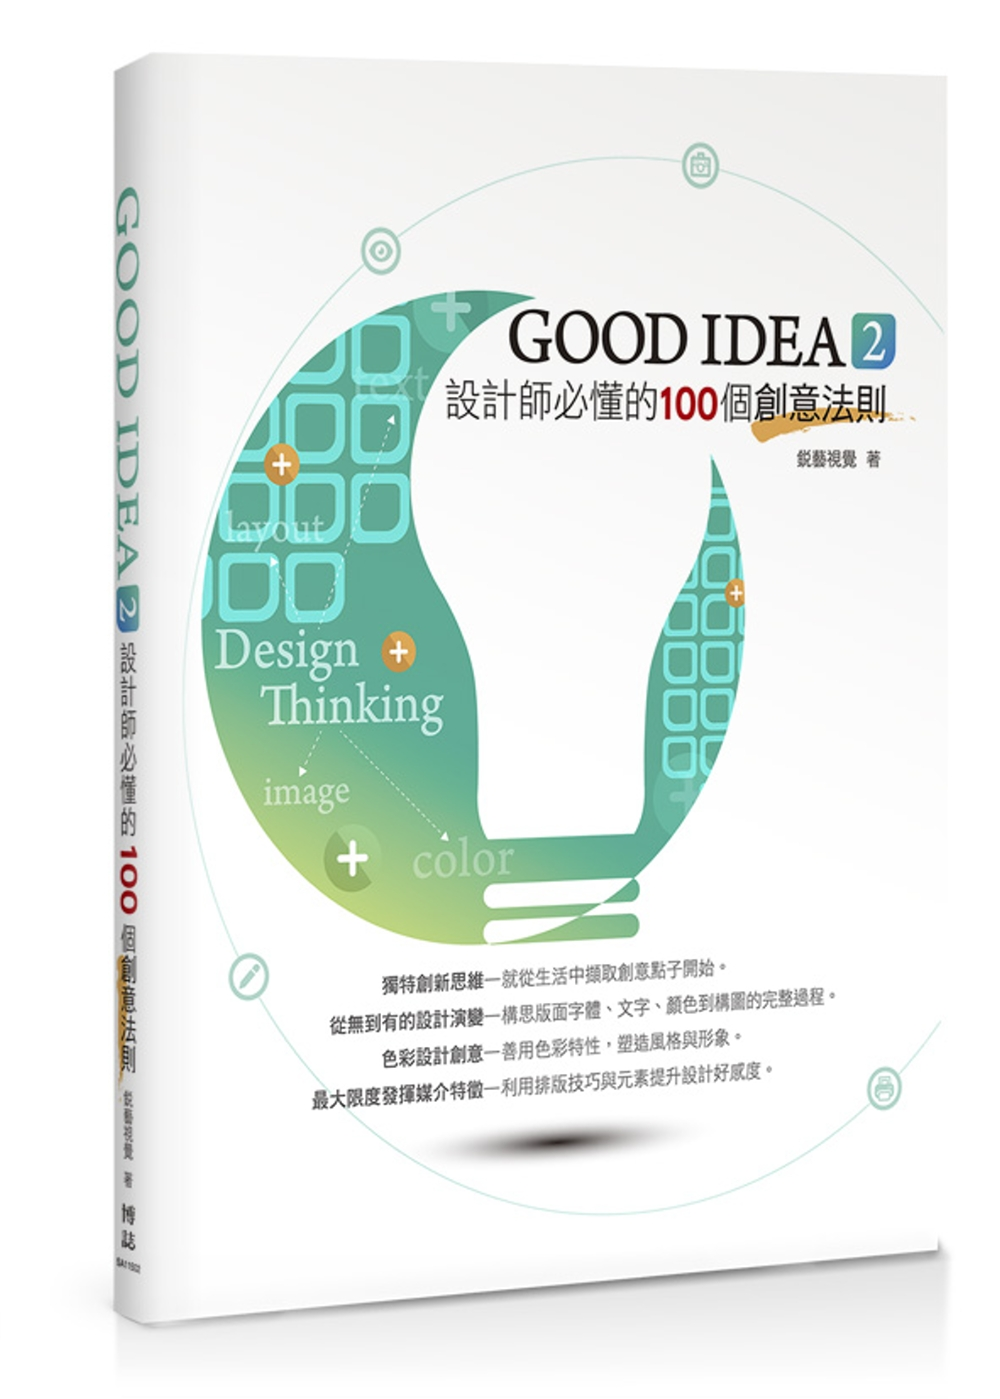 GOOD IDEA 2 設計師必懂的100個創意法則